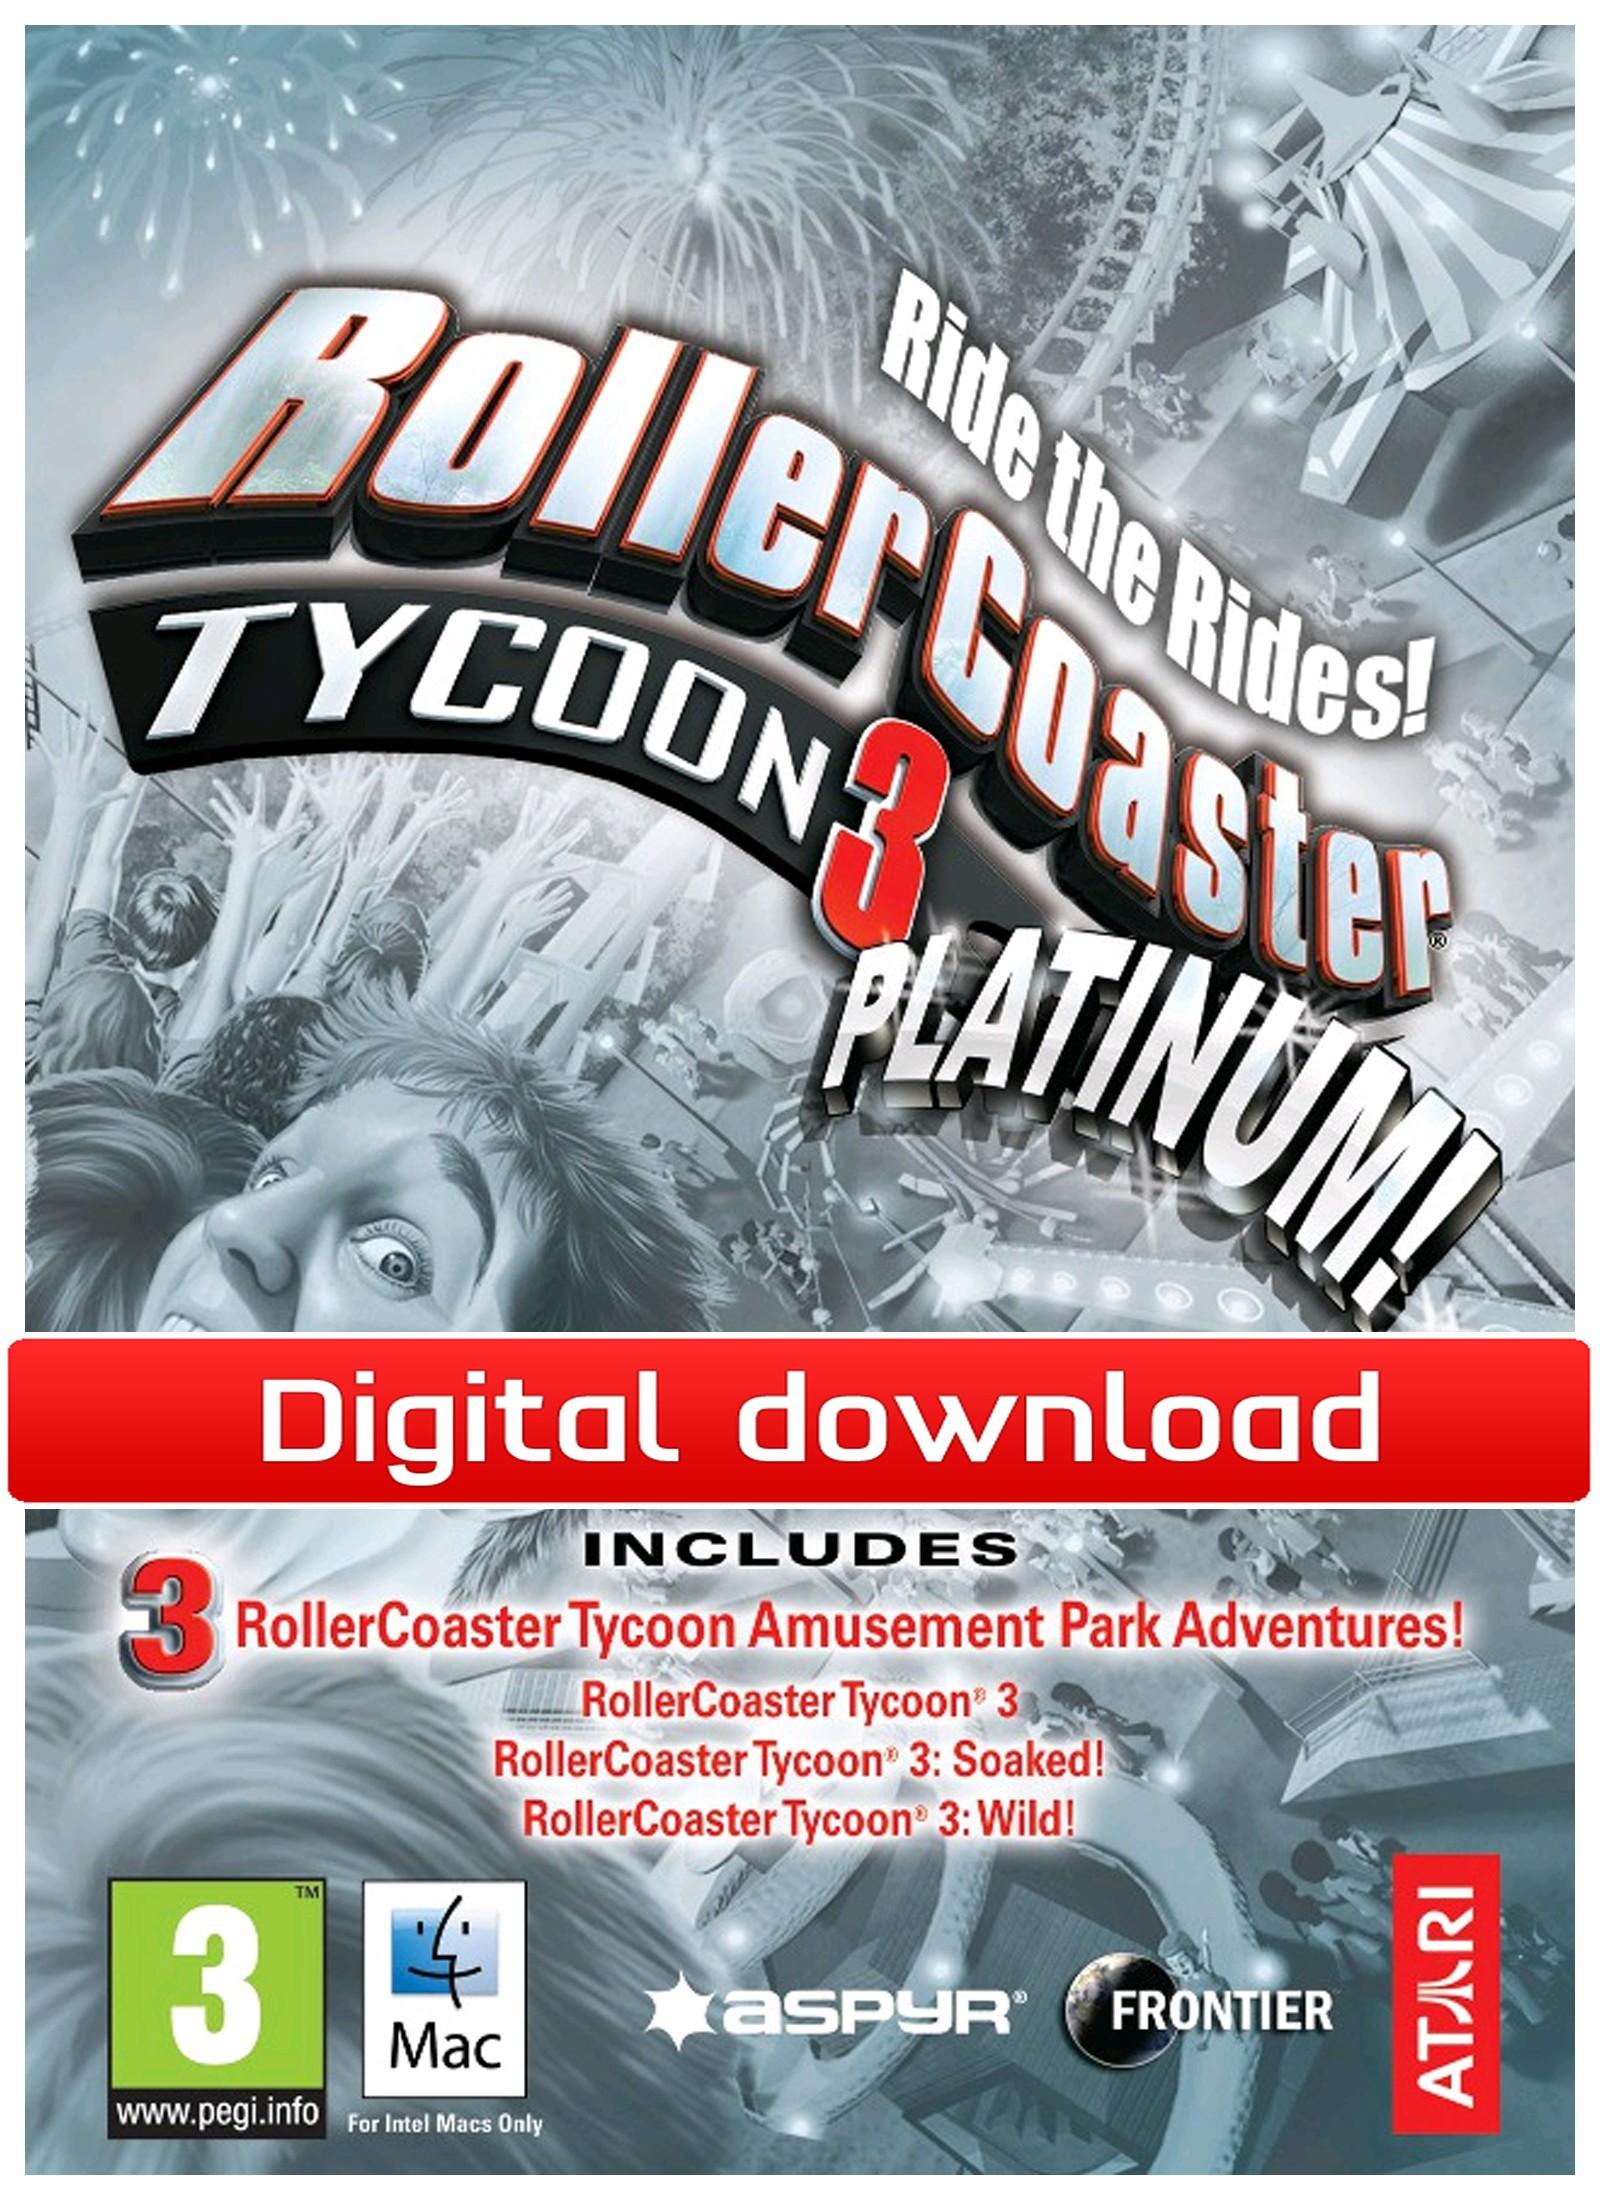 31301 : RollerCoaster Tycoon 3: Platinum (Mac nedlastning)